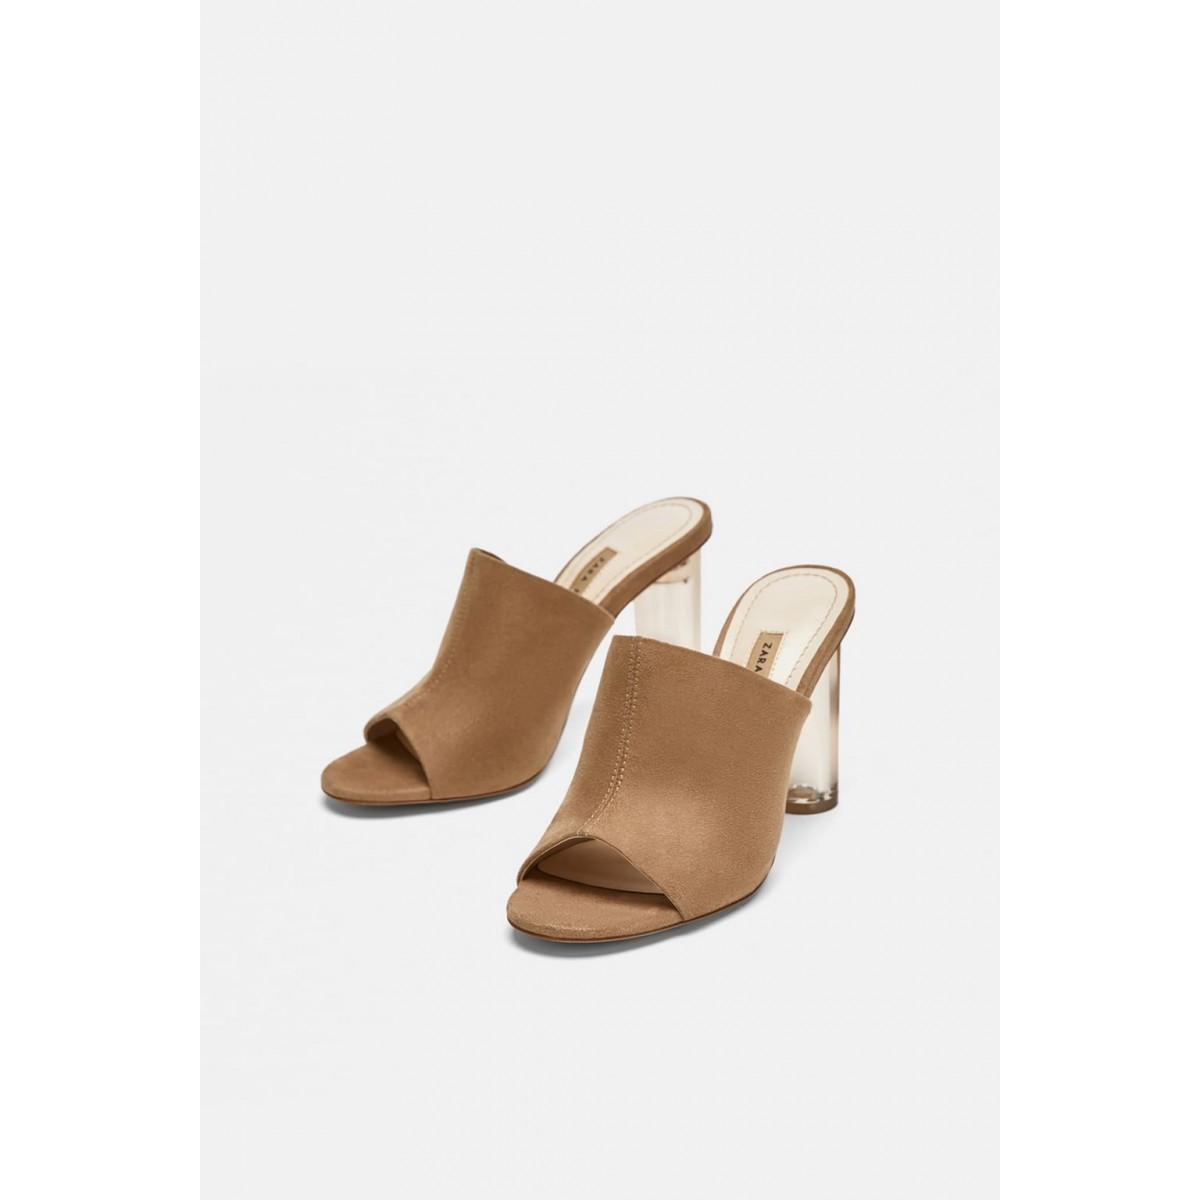 Zara High Heel Sandals With Methacrylate Heels